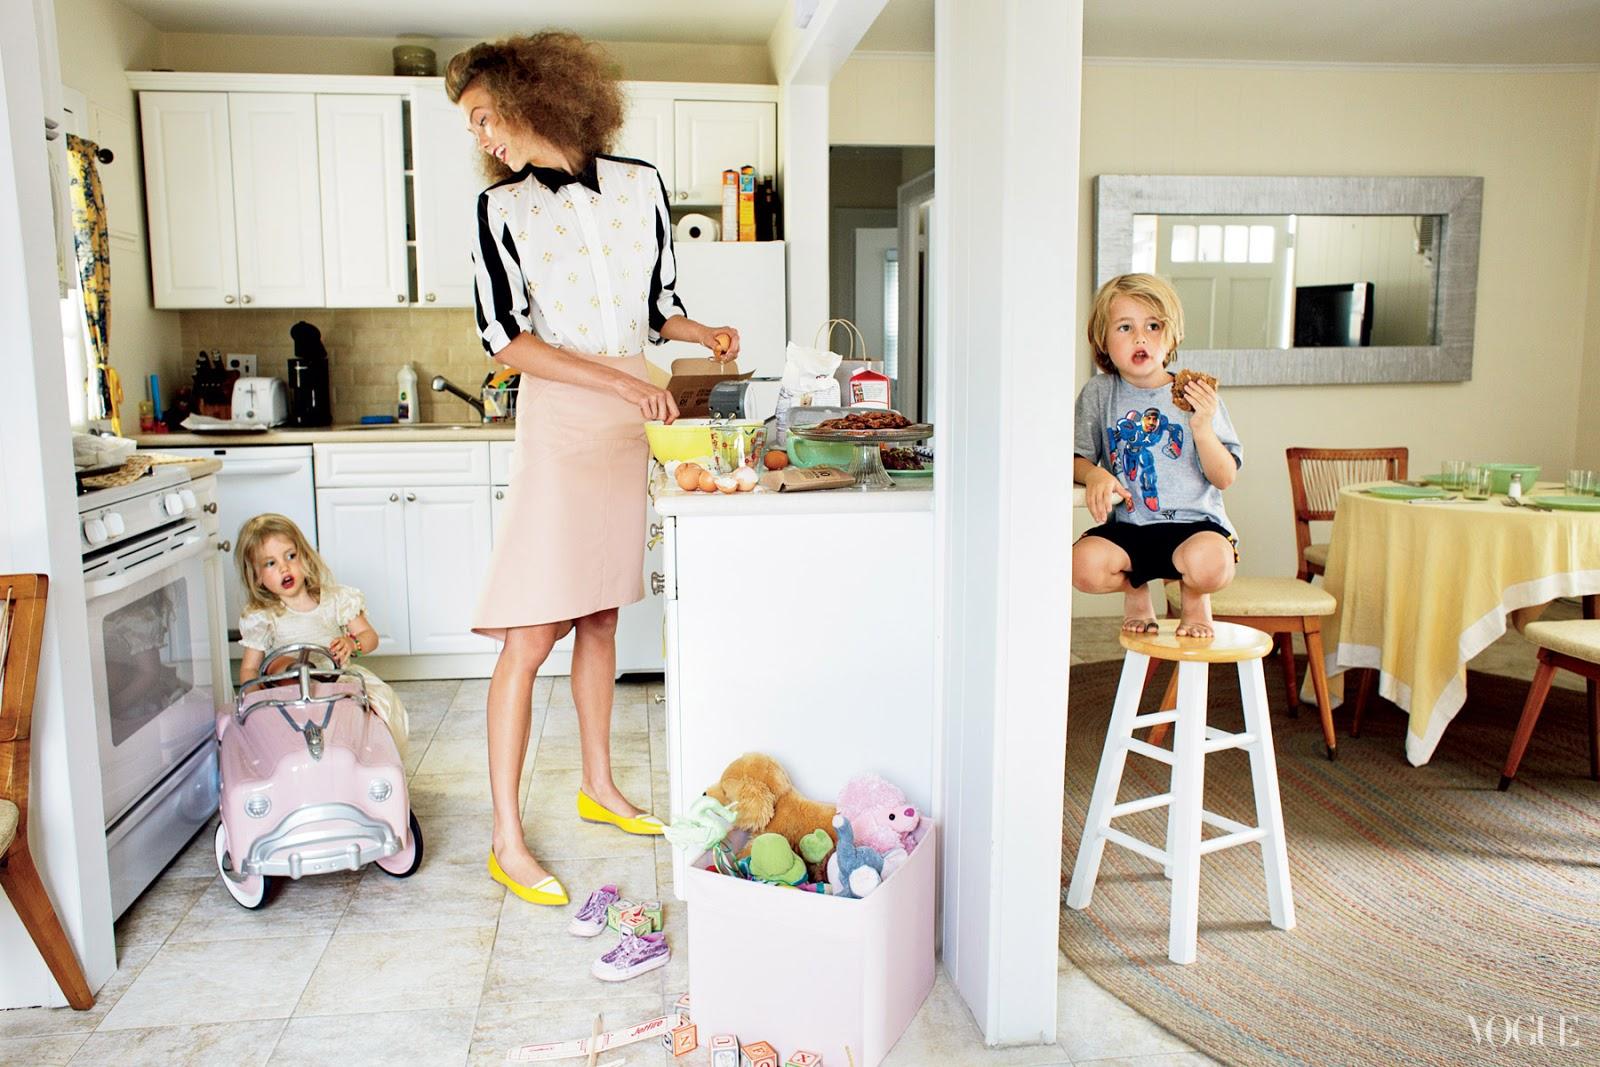 Karlie Kloss by Arthur Elgort (Little Pink Houses - US Vogue November 2012) 1